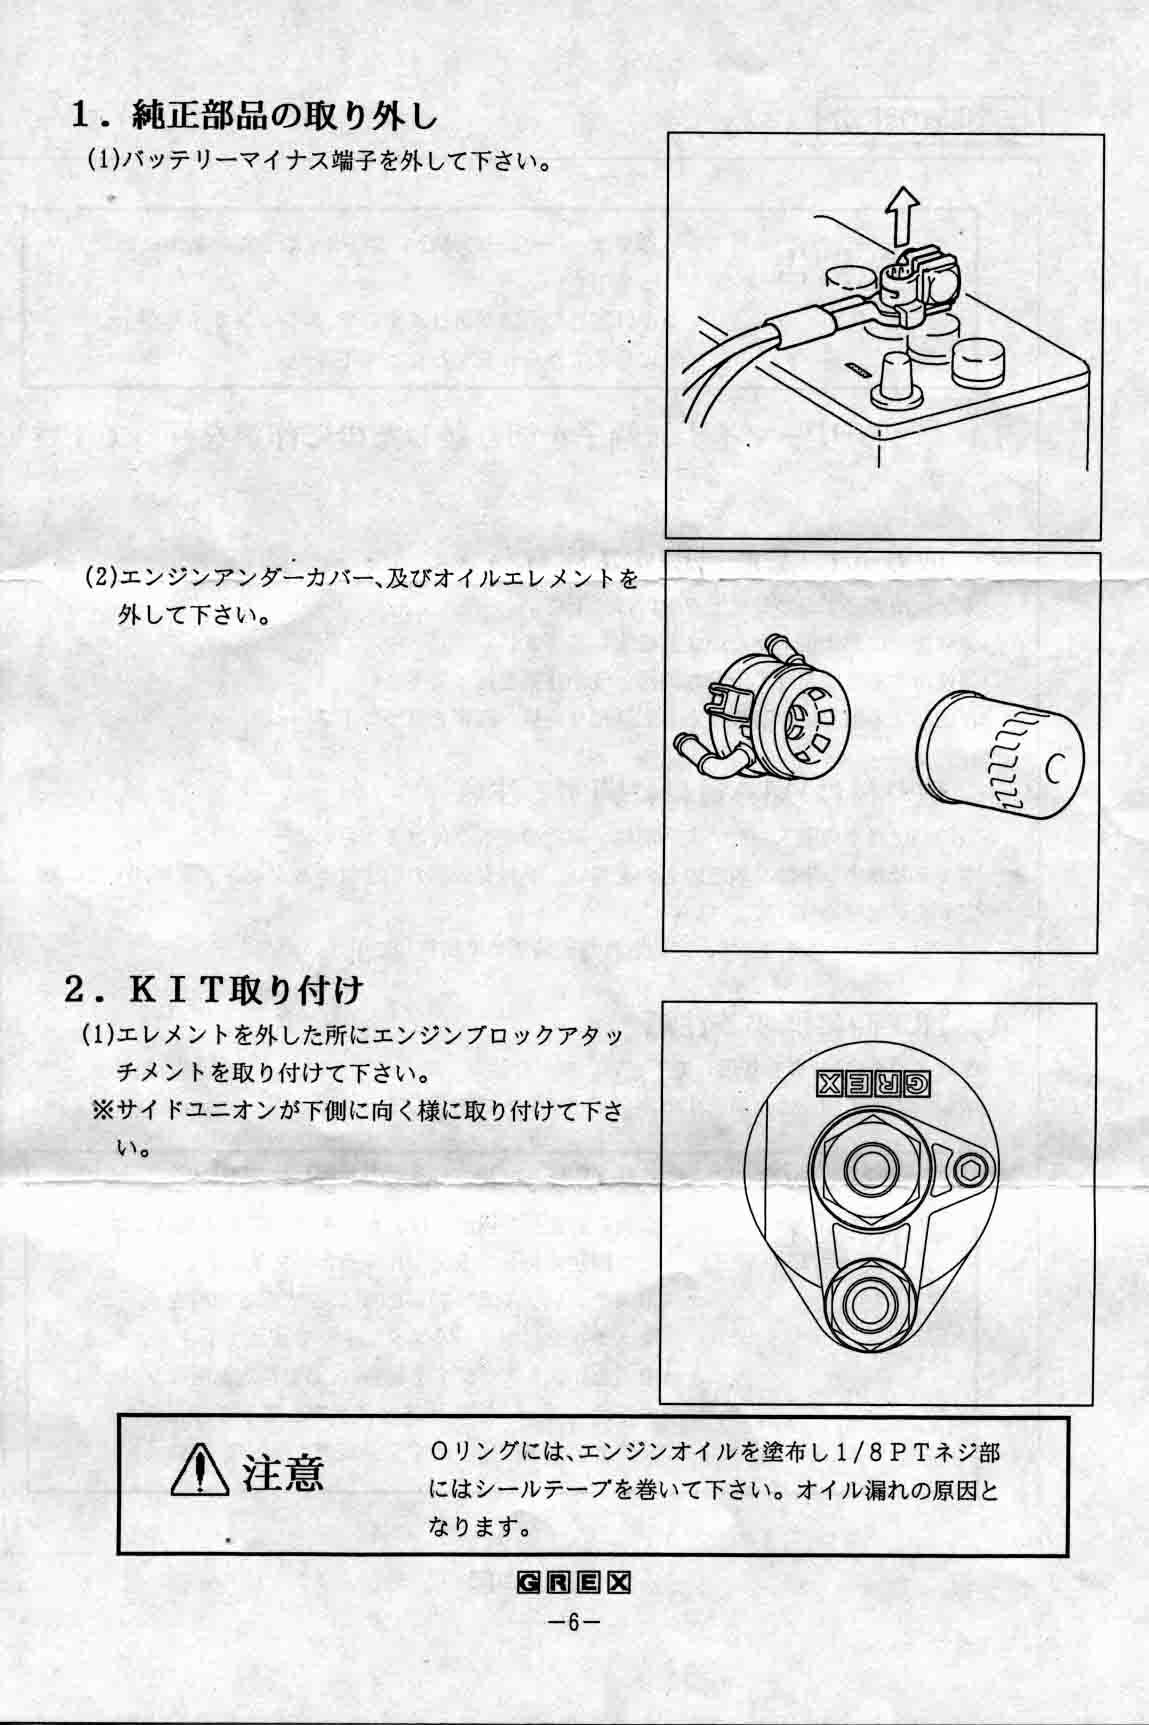 Greddy Oil Filter Relocation Kit Photos Manual Mkiv